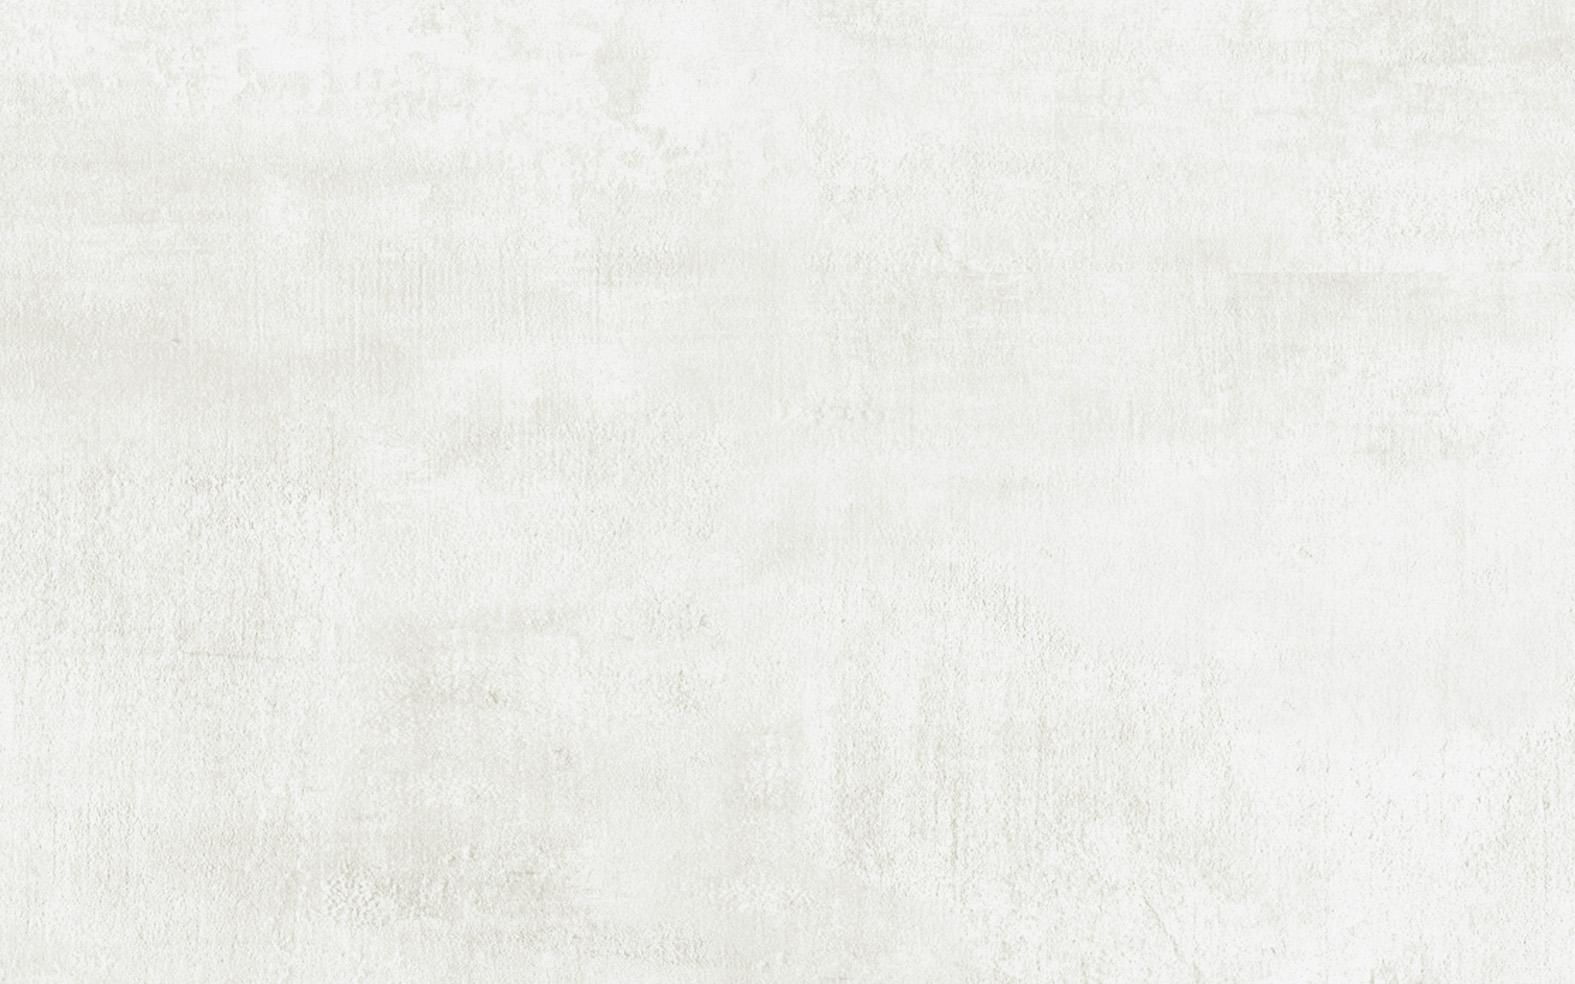 K94467700001VTE0, Cosy, Valkoinen, seina